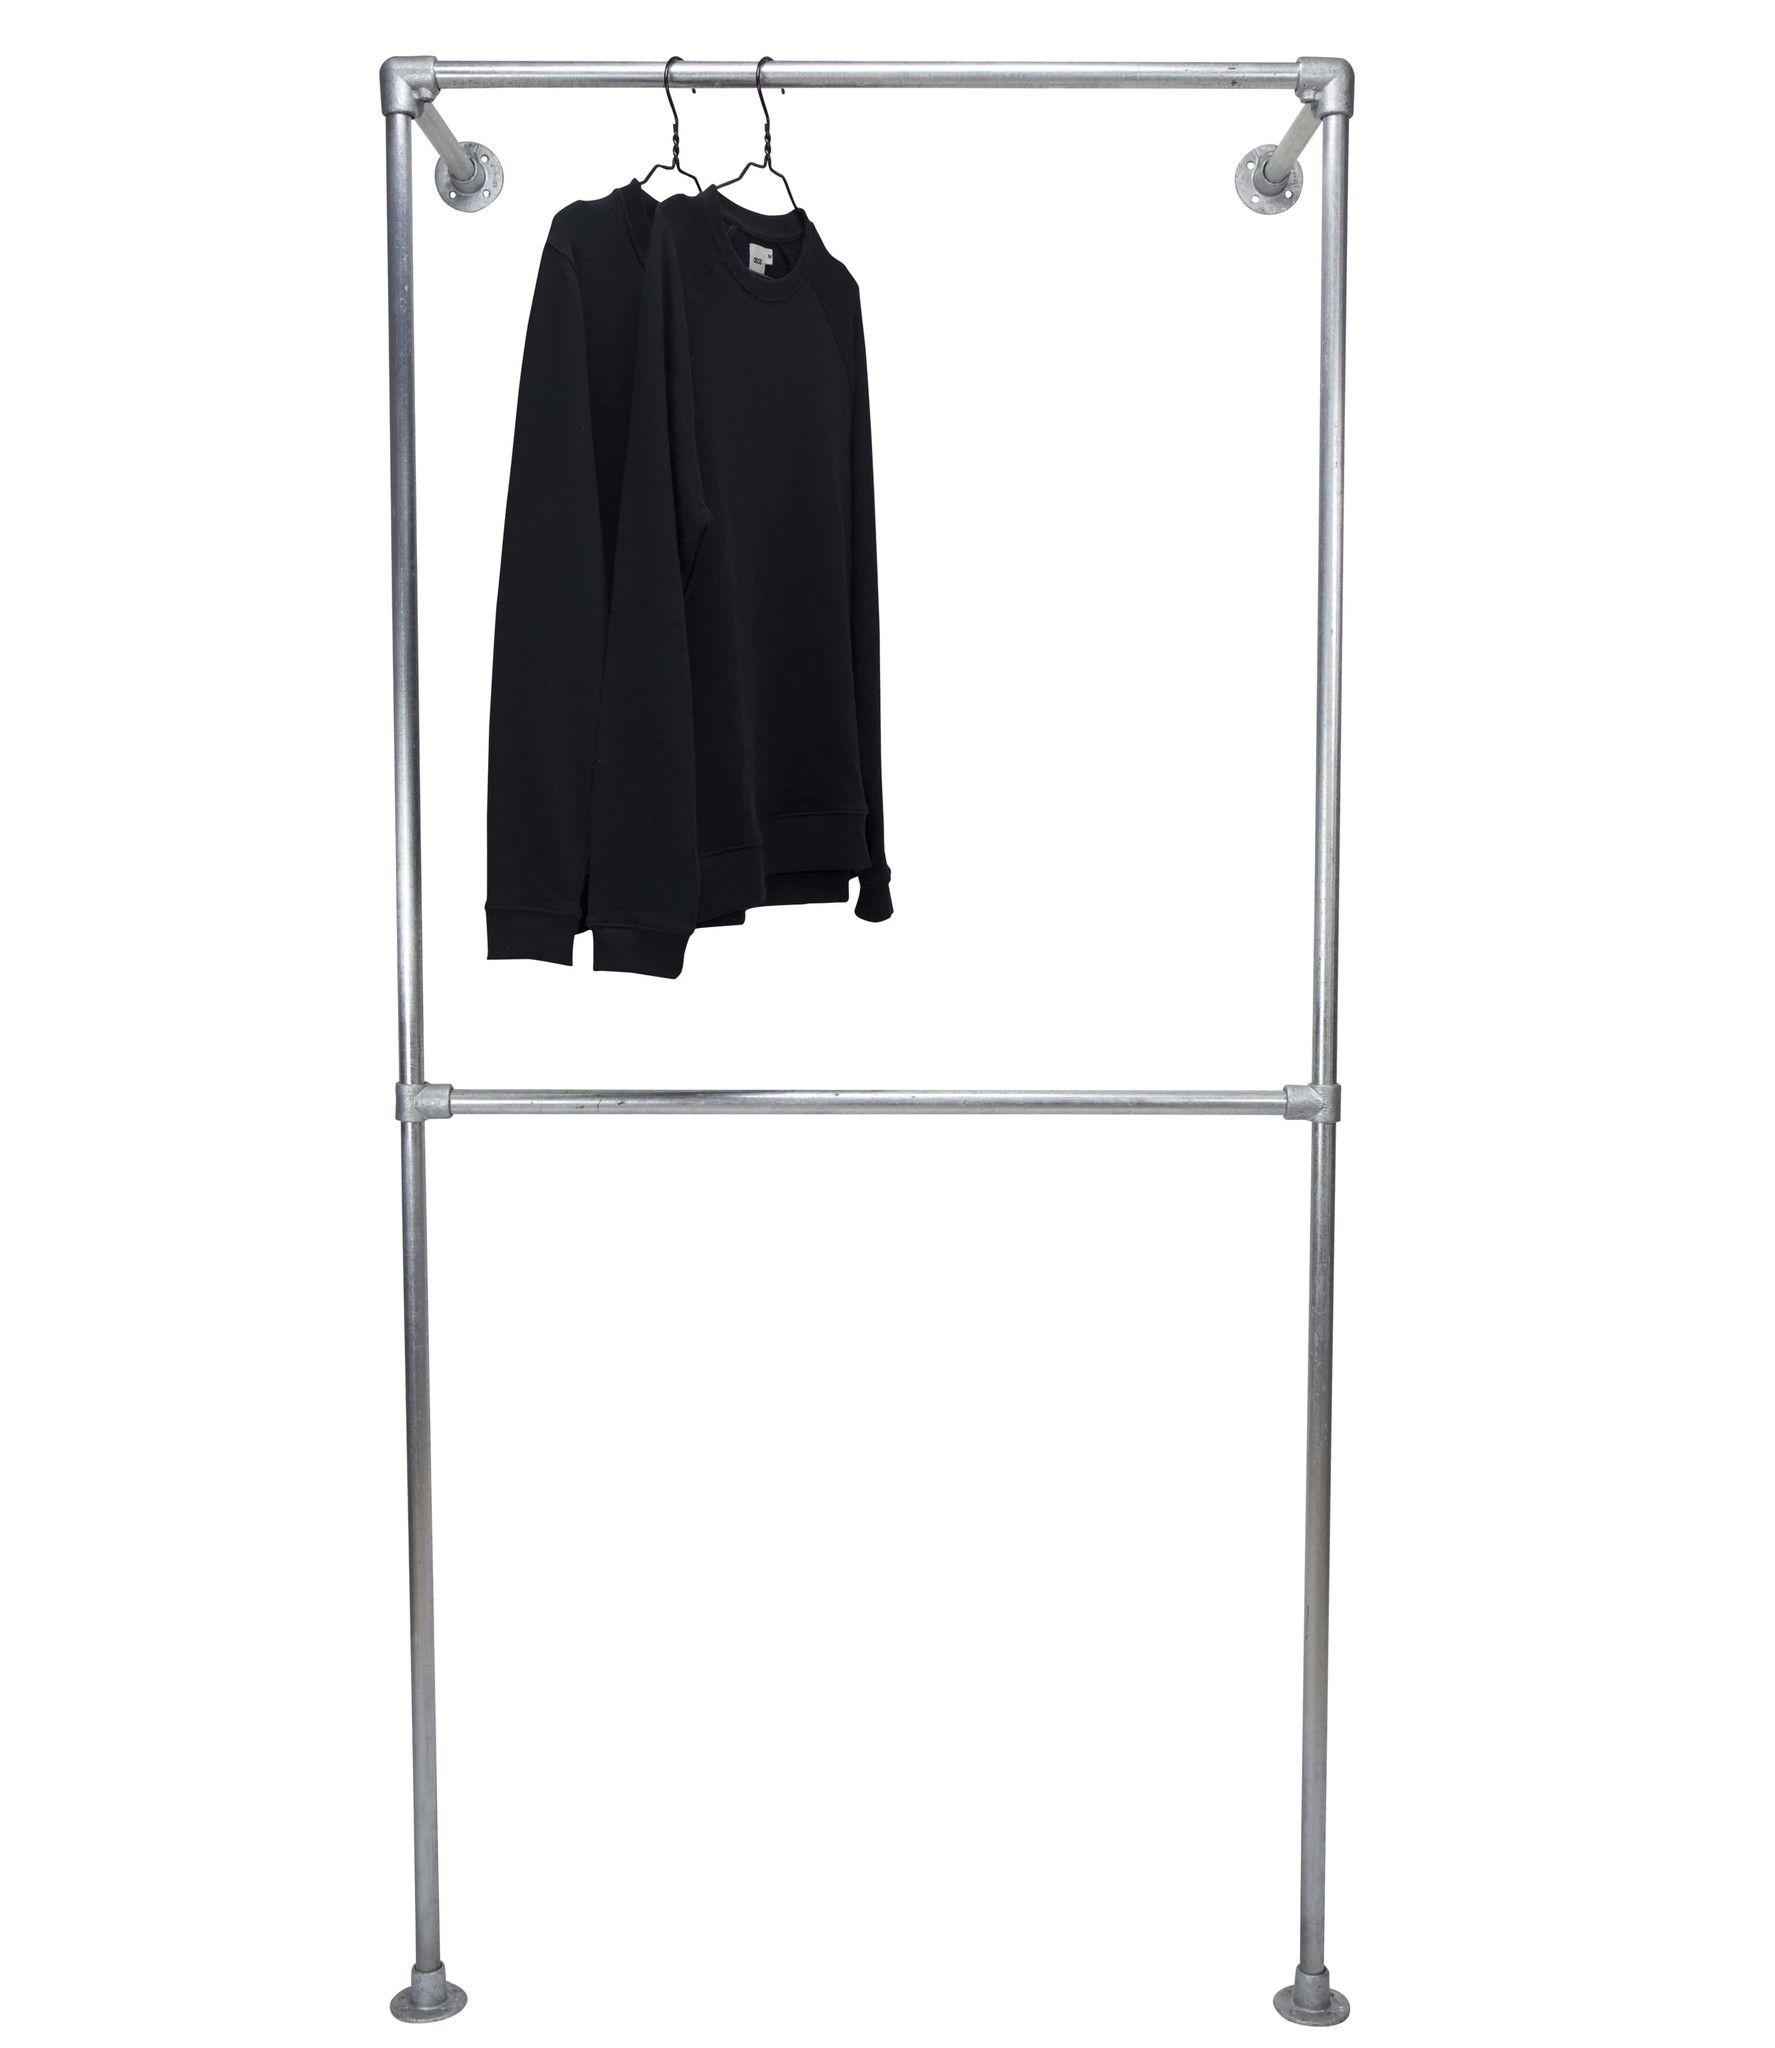 double wall clothes rail clothes rail walls and storage ideas rh pinterest com